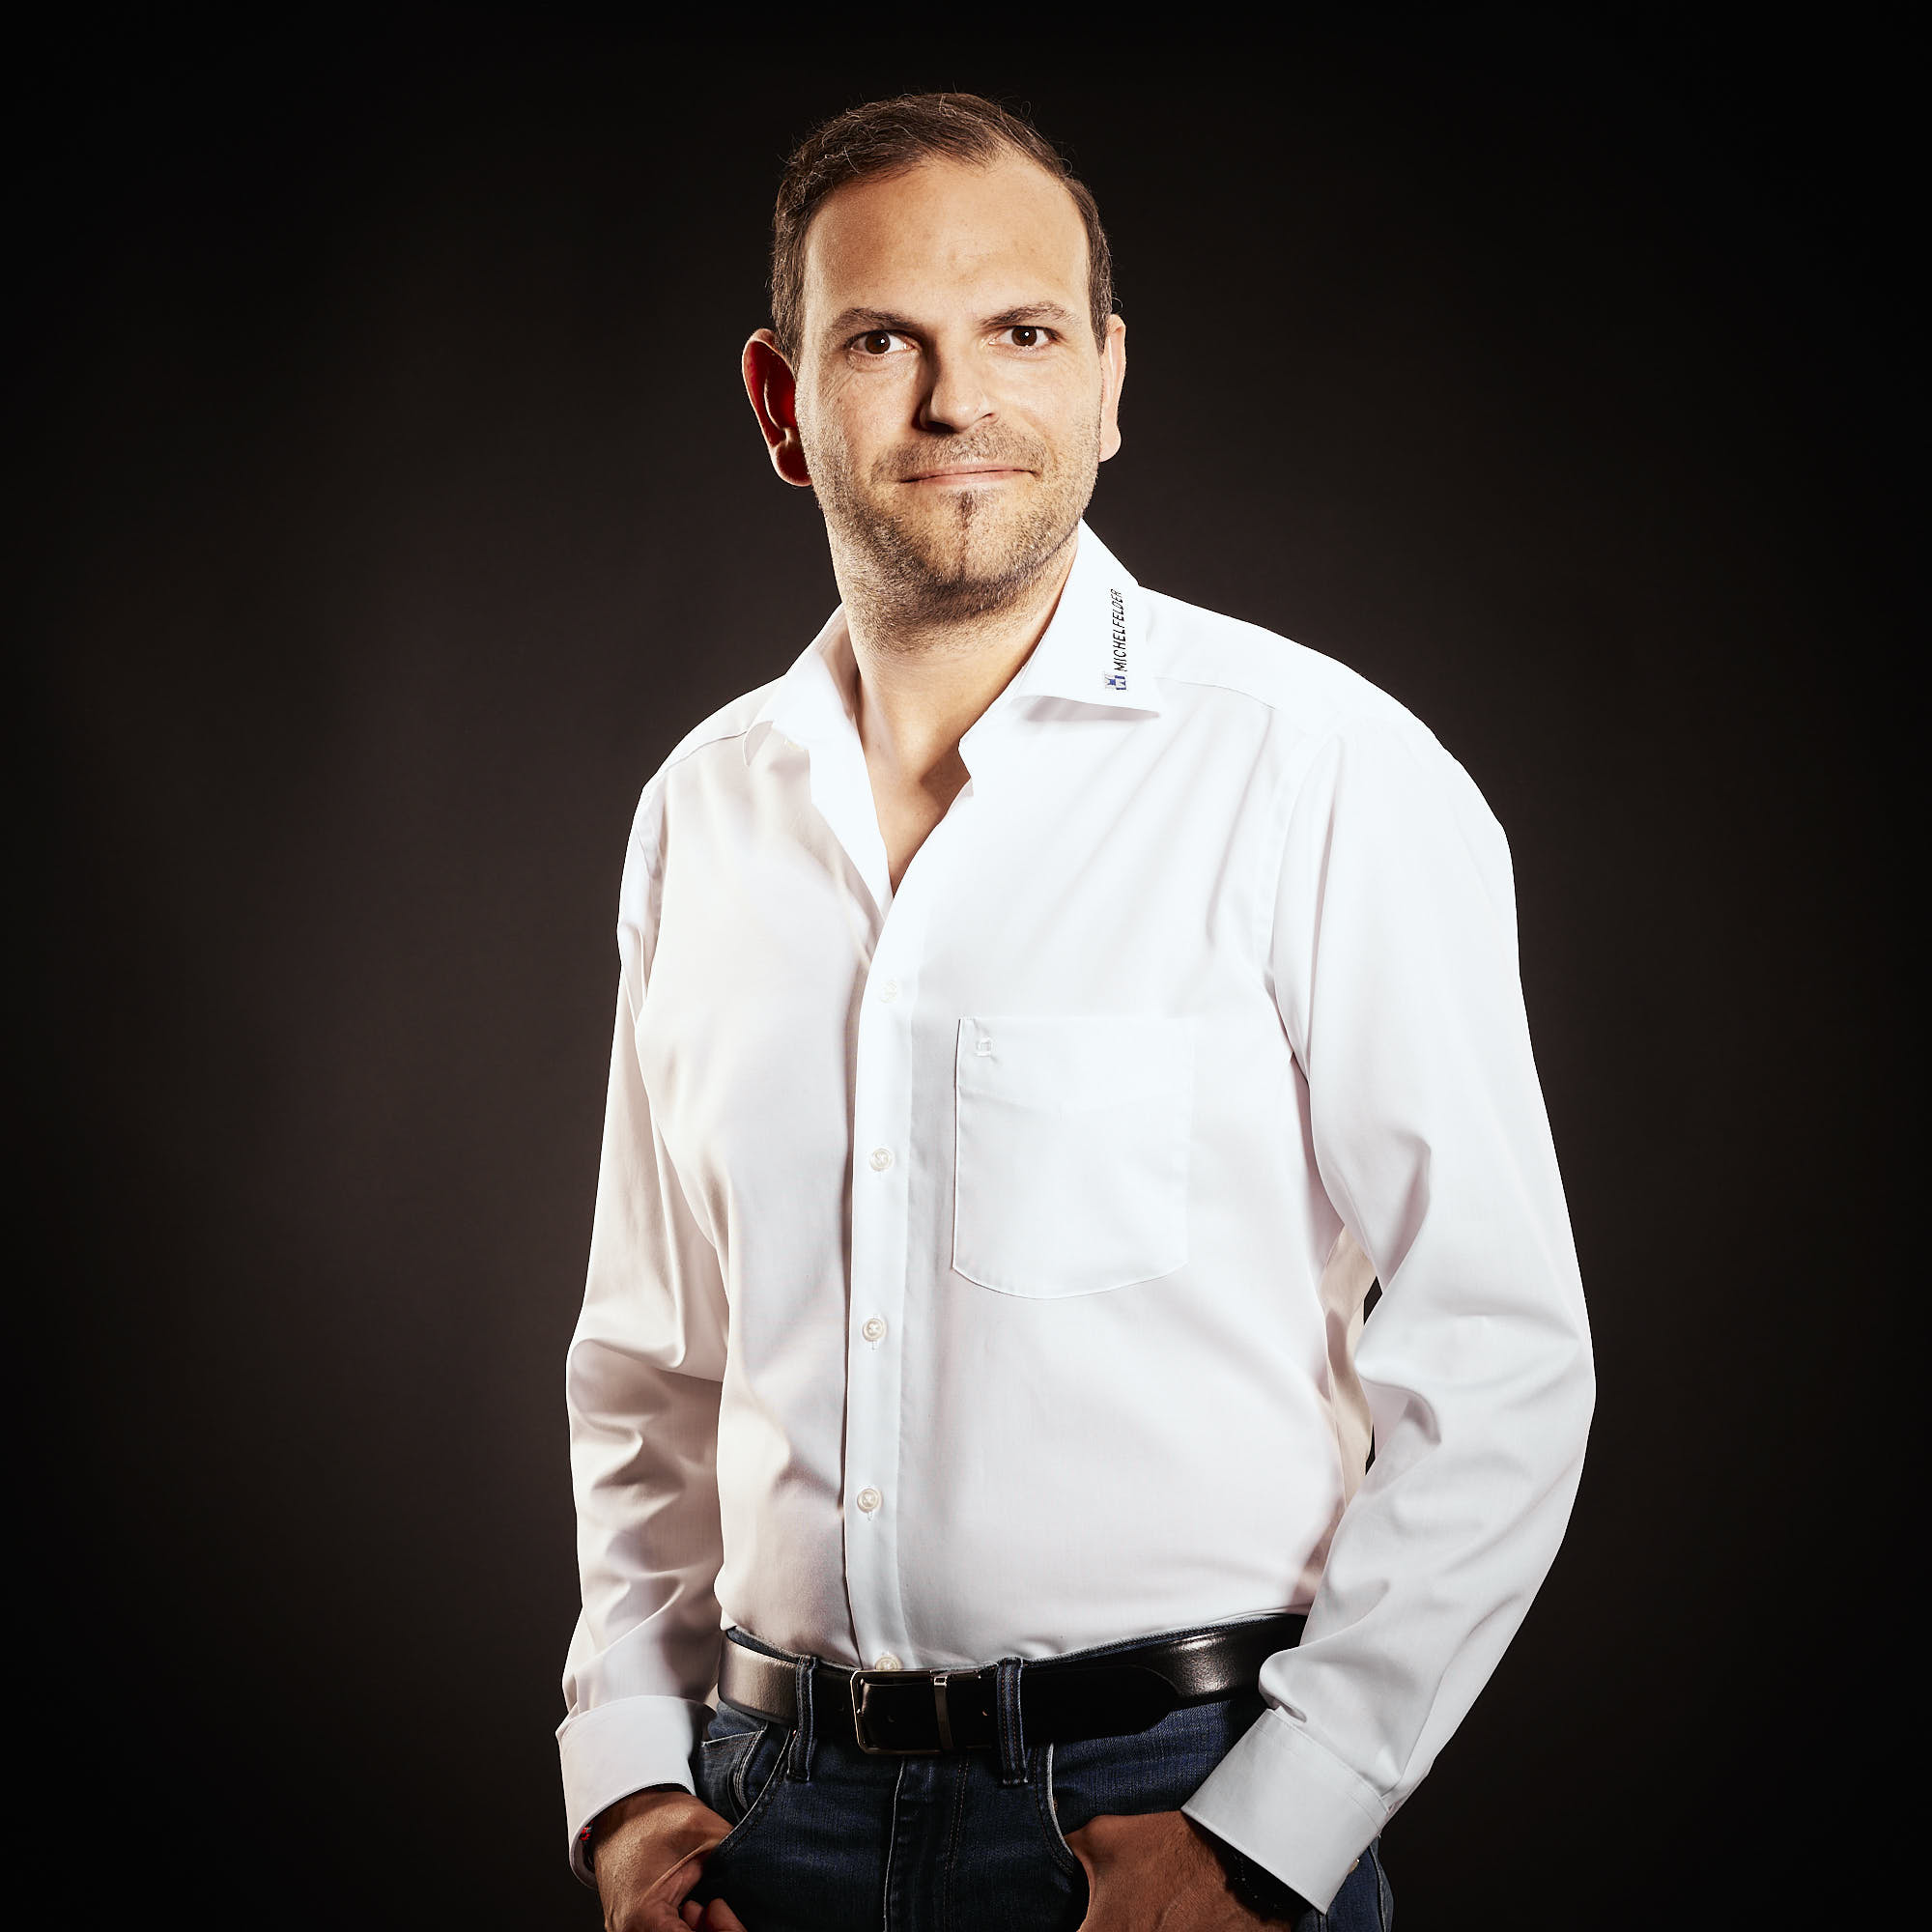 Marc Reger Key Account Manager Metalltechnik   Medizintechnik - Ansprechpartner Michelfelder GmbH